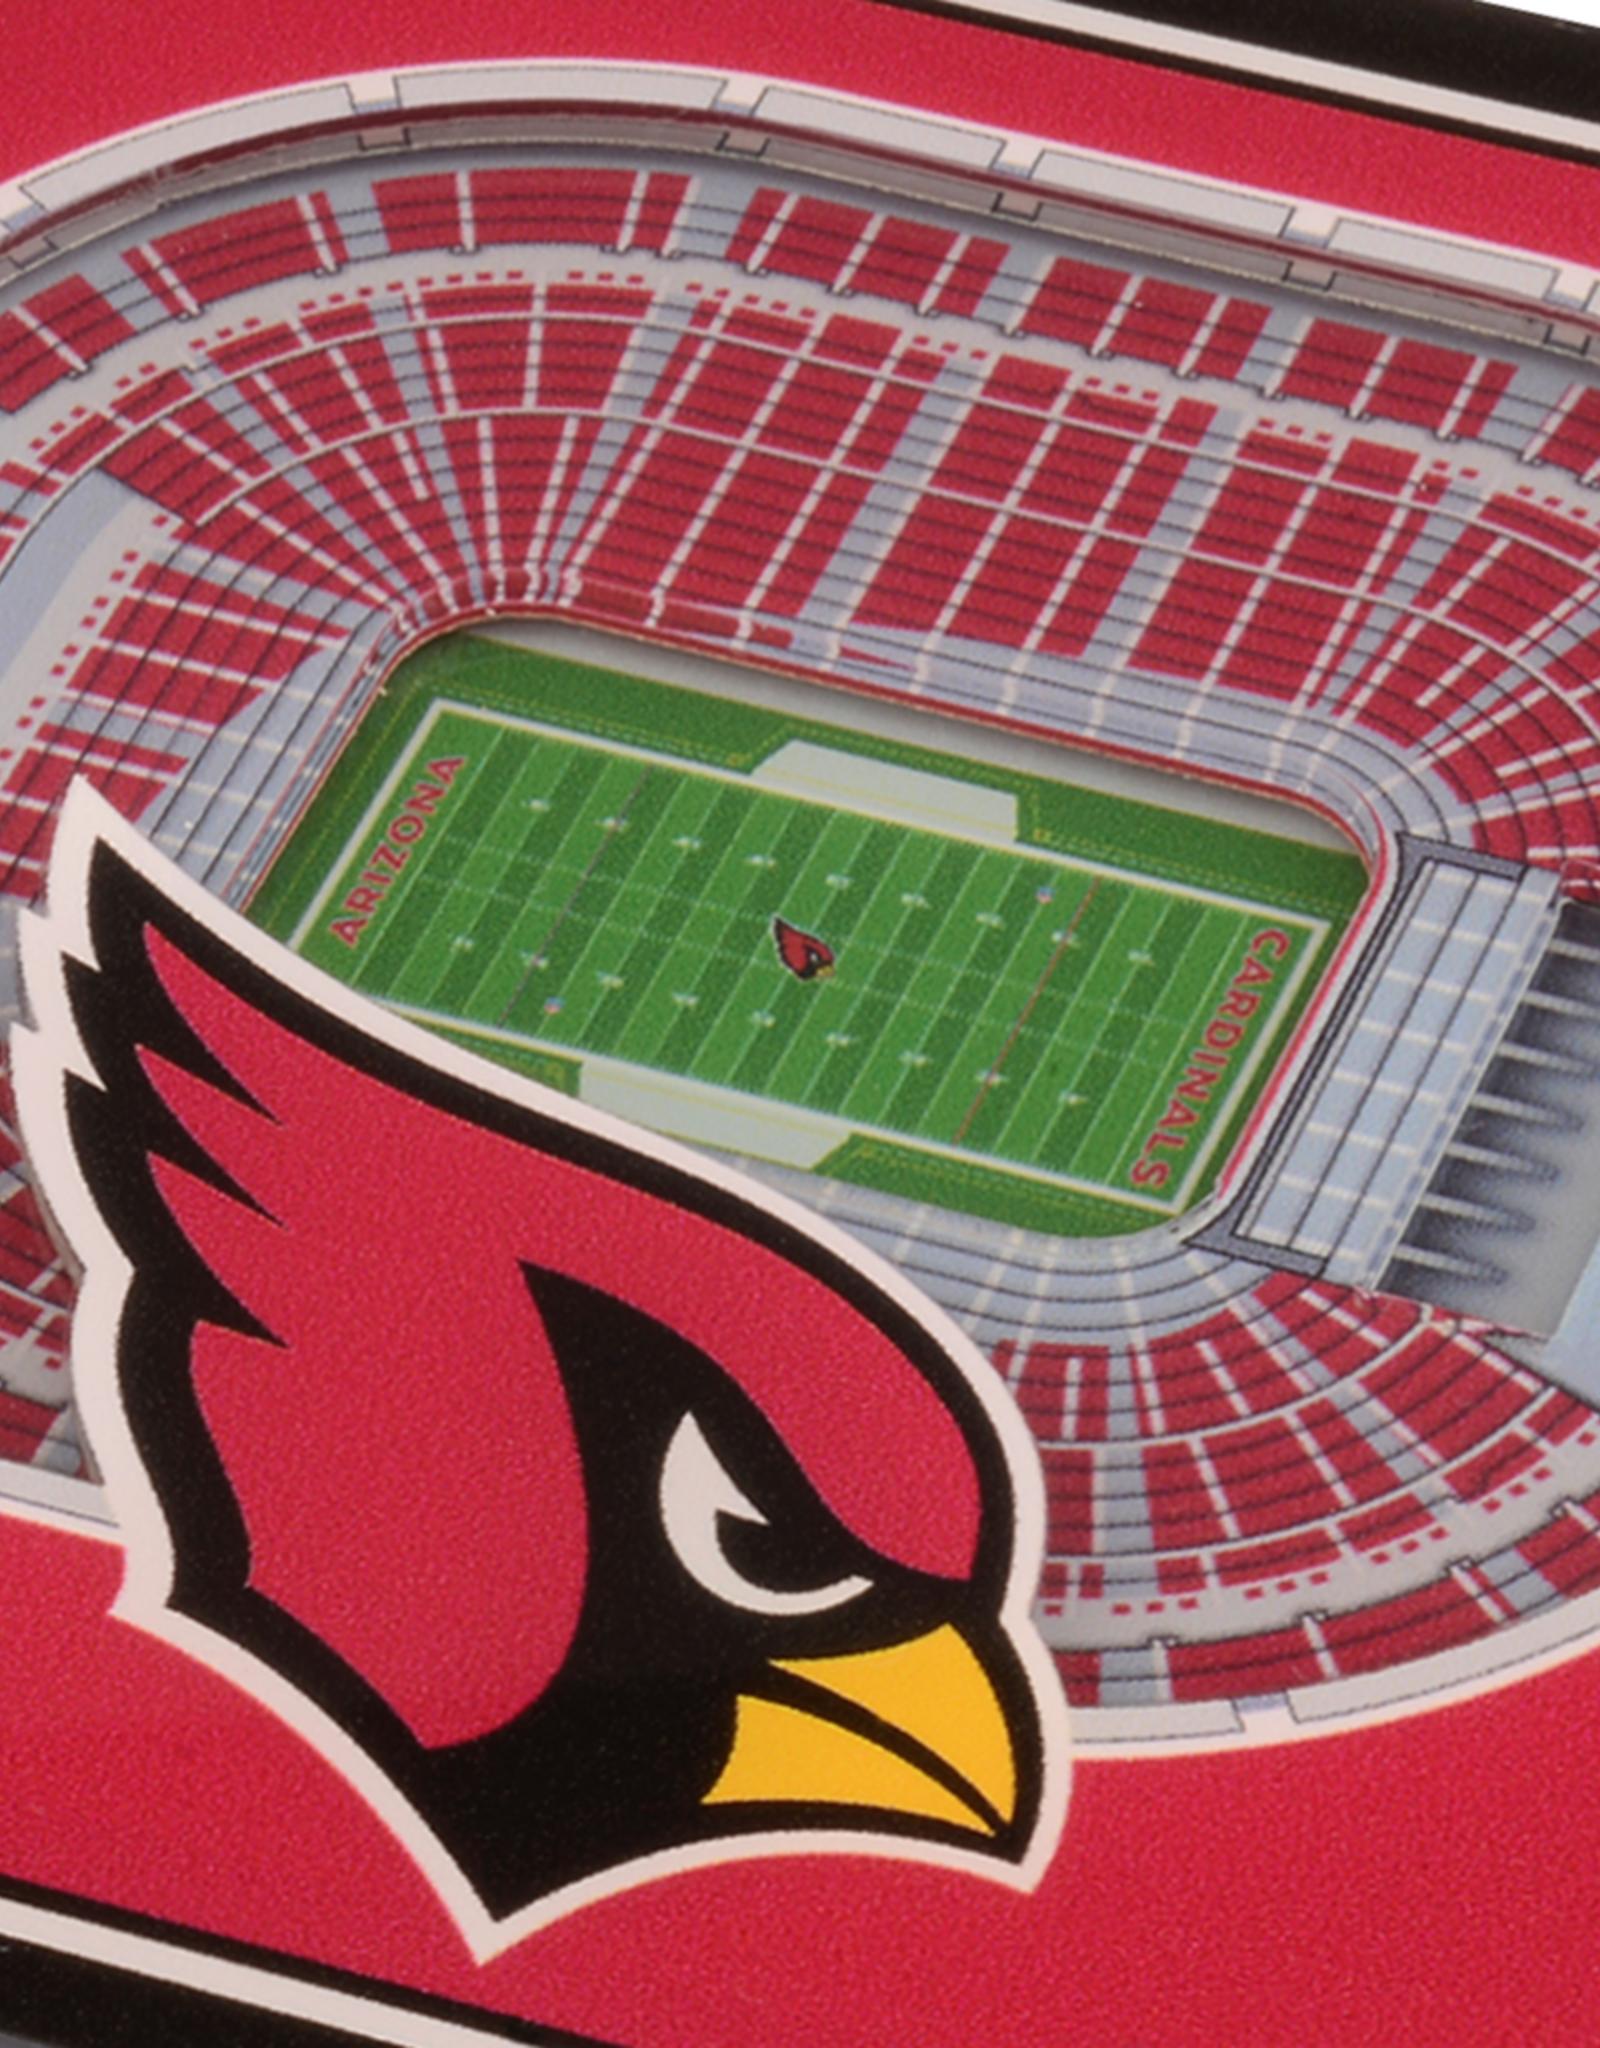 YOU THE FAN Arizona Cardinals 3-D StadiumViews Coasters 2-Pack